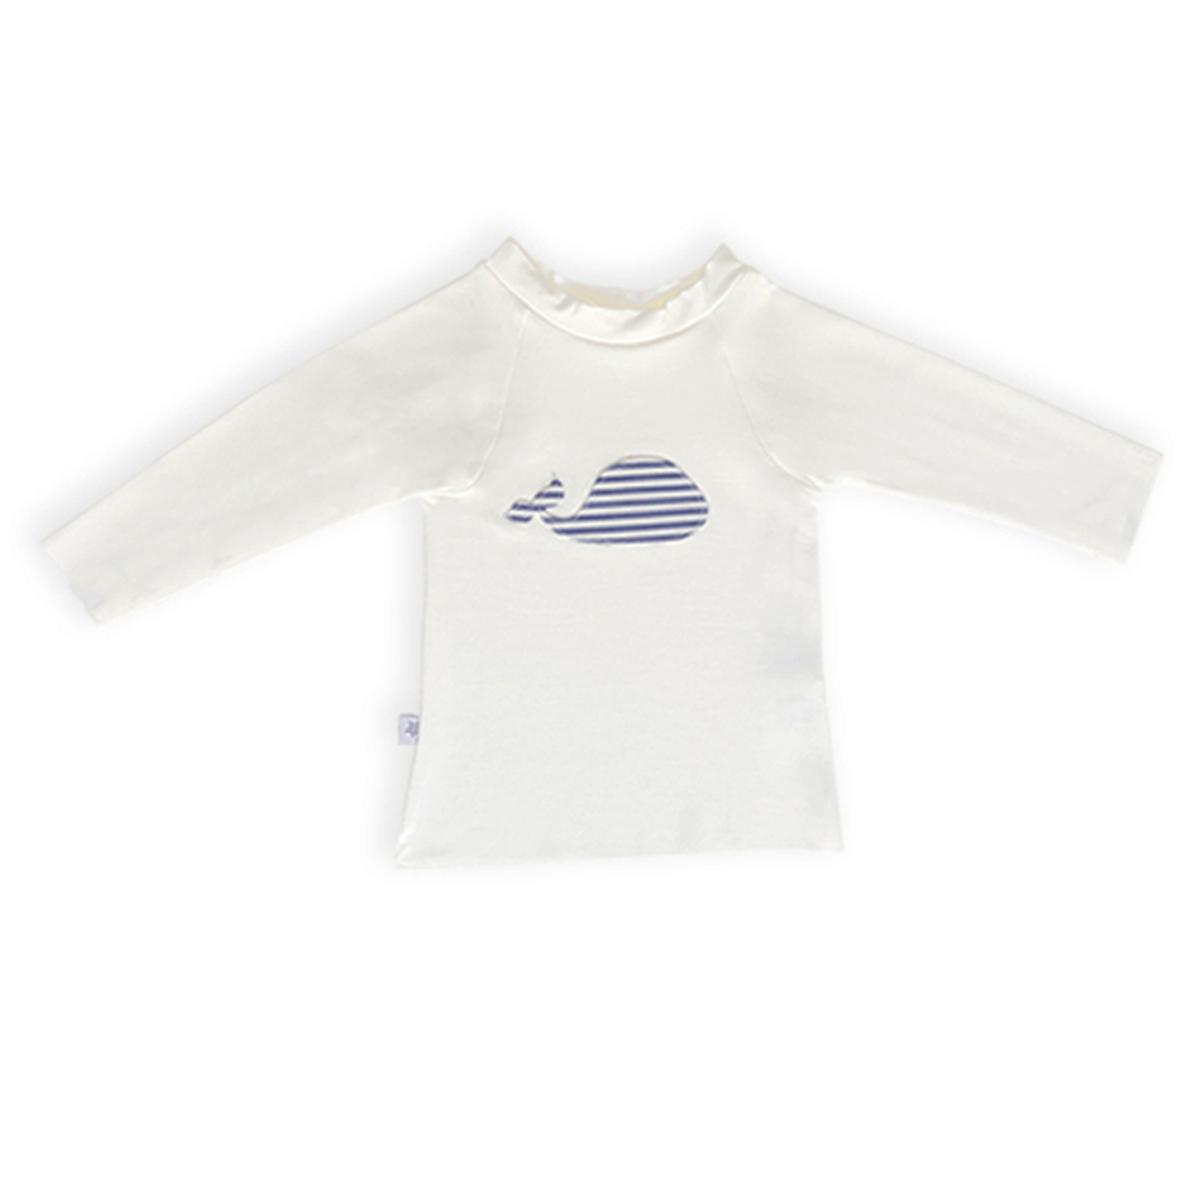 Accessoires bébé Tee-Shirt Anti-UV Marin Mousse - 24 Mois Tee-Shirt Anti-UV Marin Mousse - 24 Mois